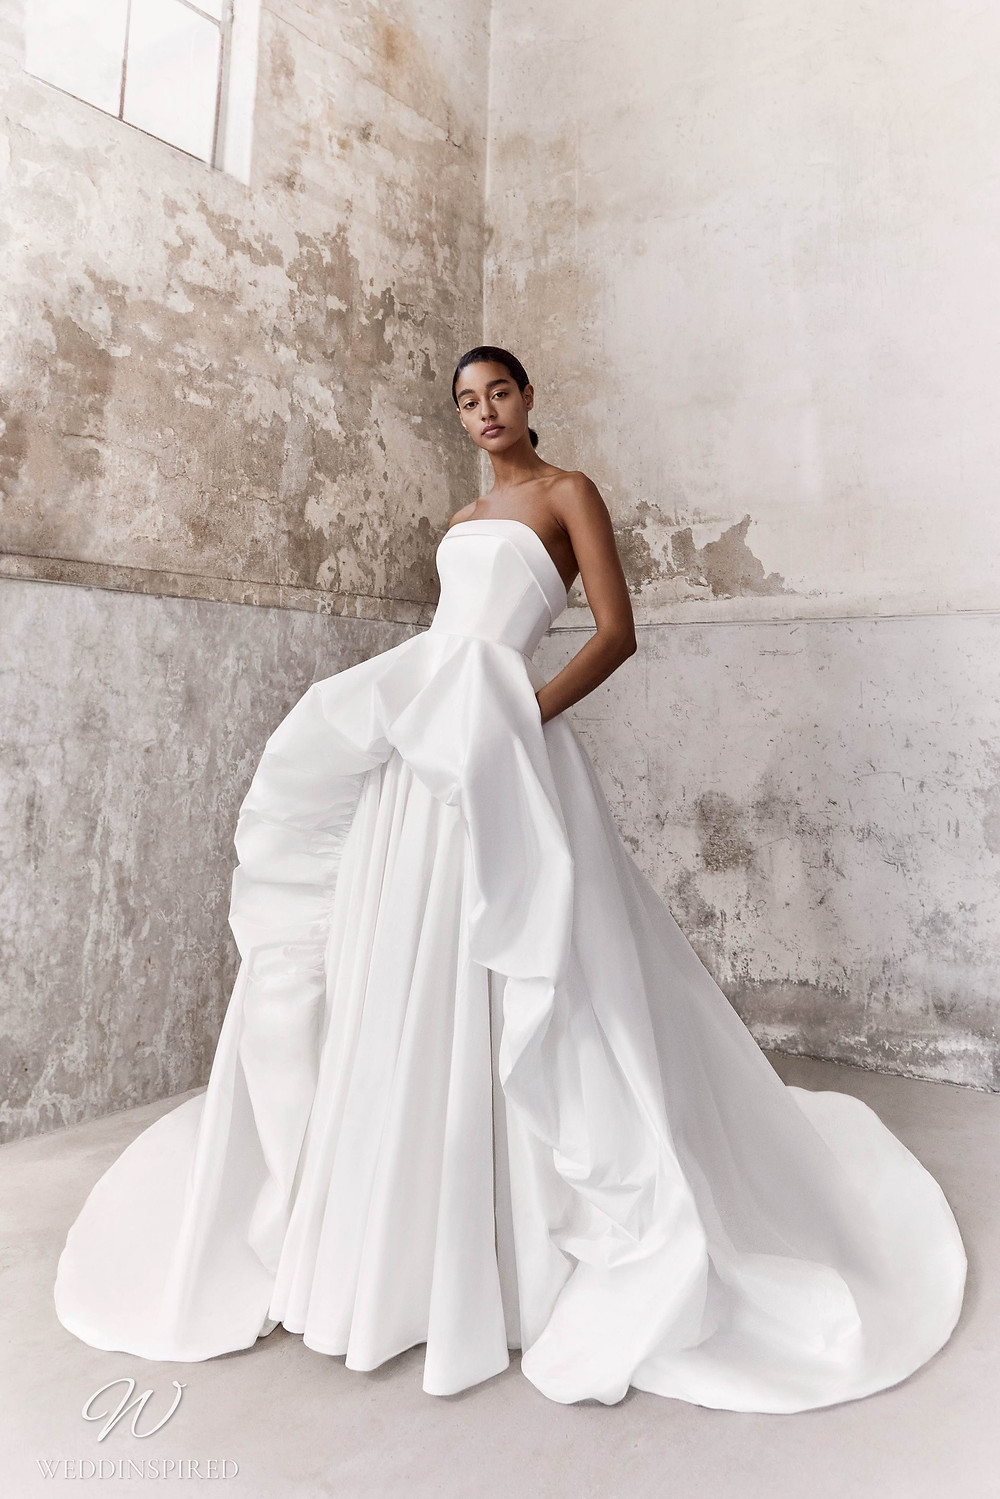 A Viktor & Rolf Fall/Winter 2021 simple strapless ball gown wedding dress with a layered ruffle skirt